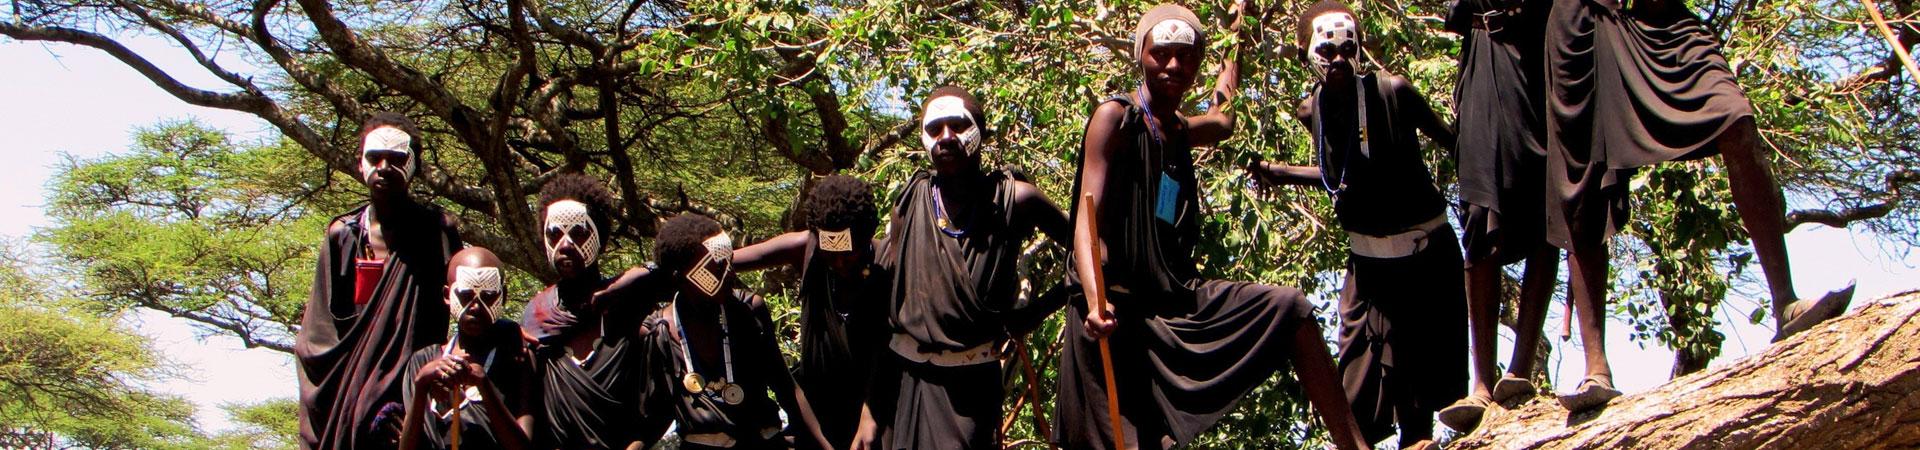 6-Day-Tanzania-Hadzabe-Culture-and-Wildlife-Safaris